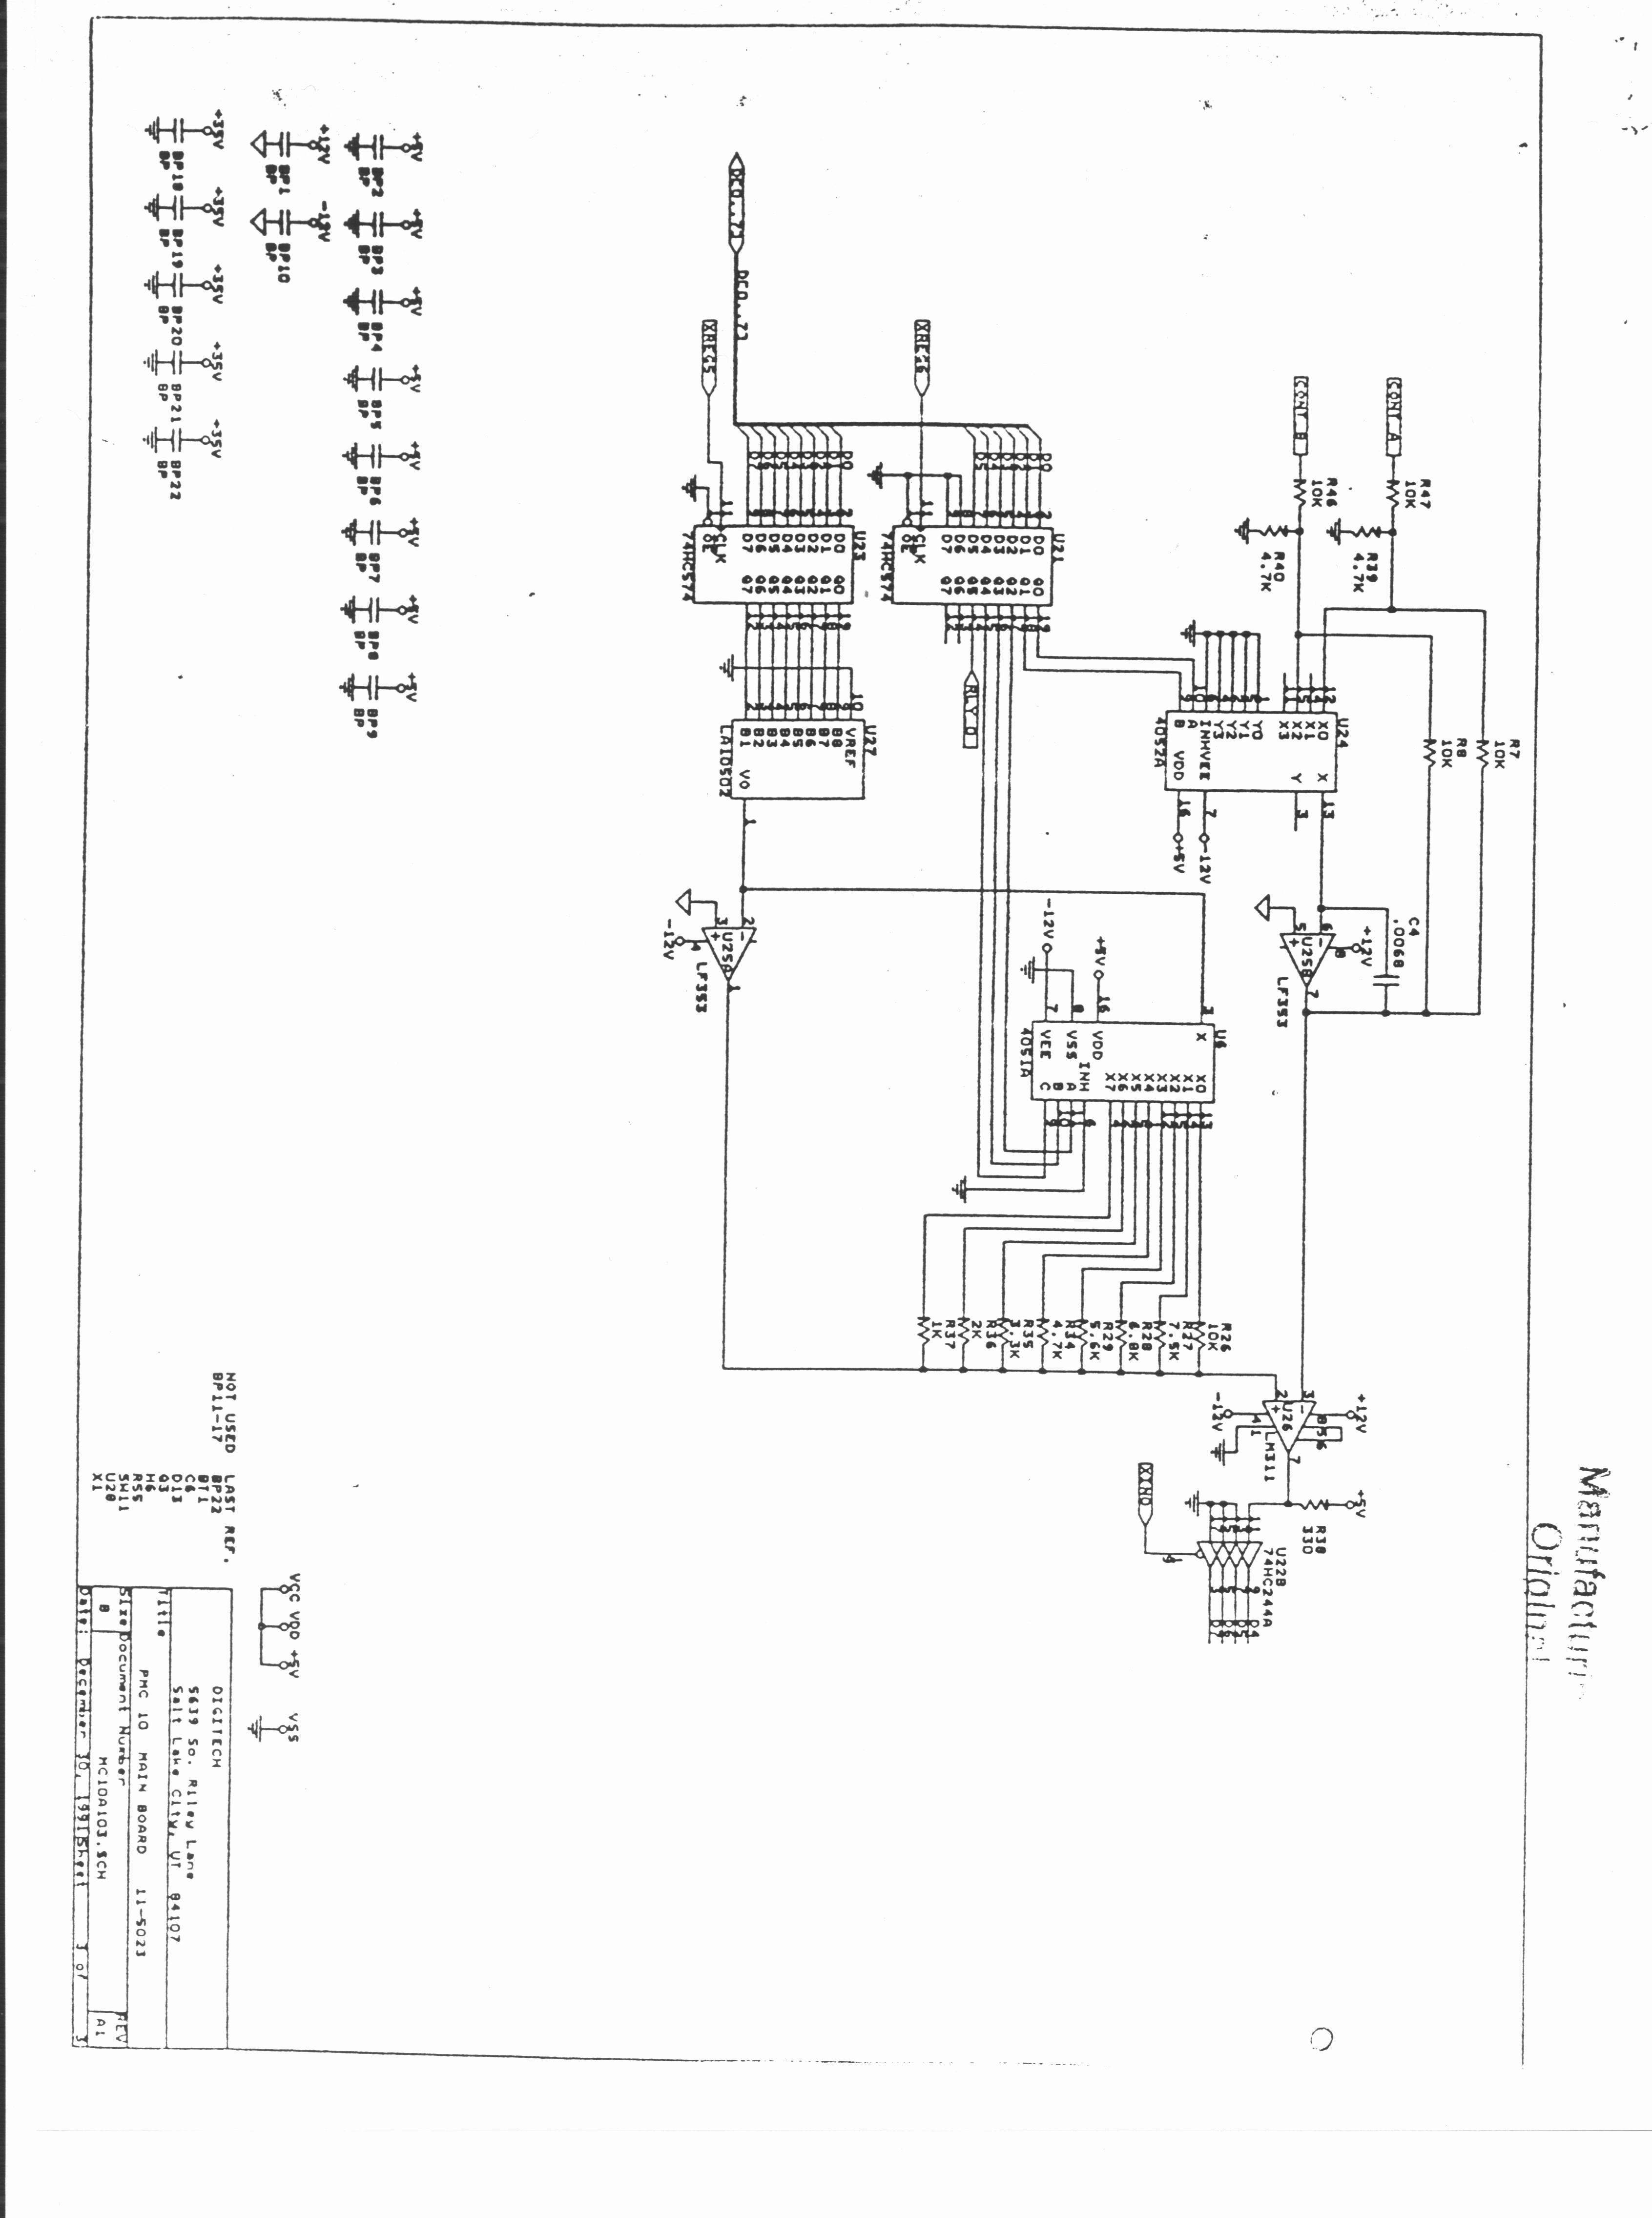 Digitech PMC-10 MIDI Foot Pedal